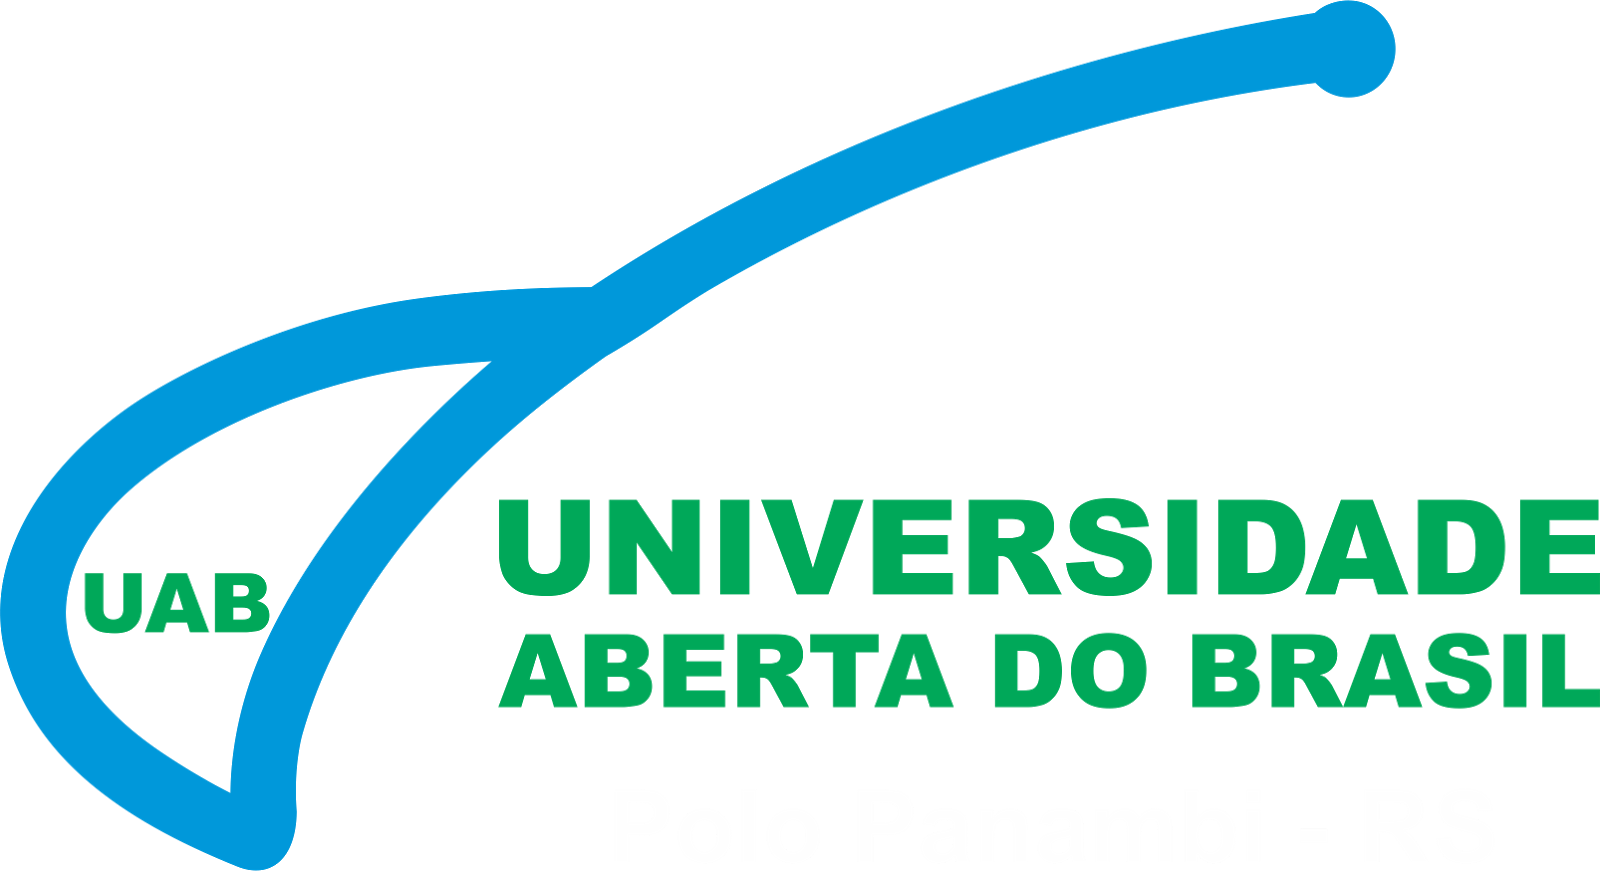 Acesse o site do Polo UAB Panambi: